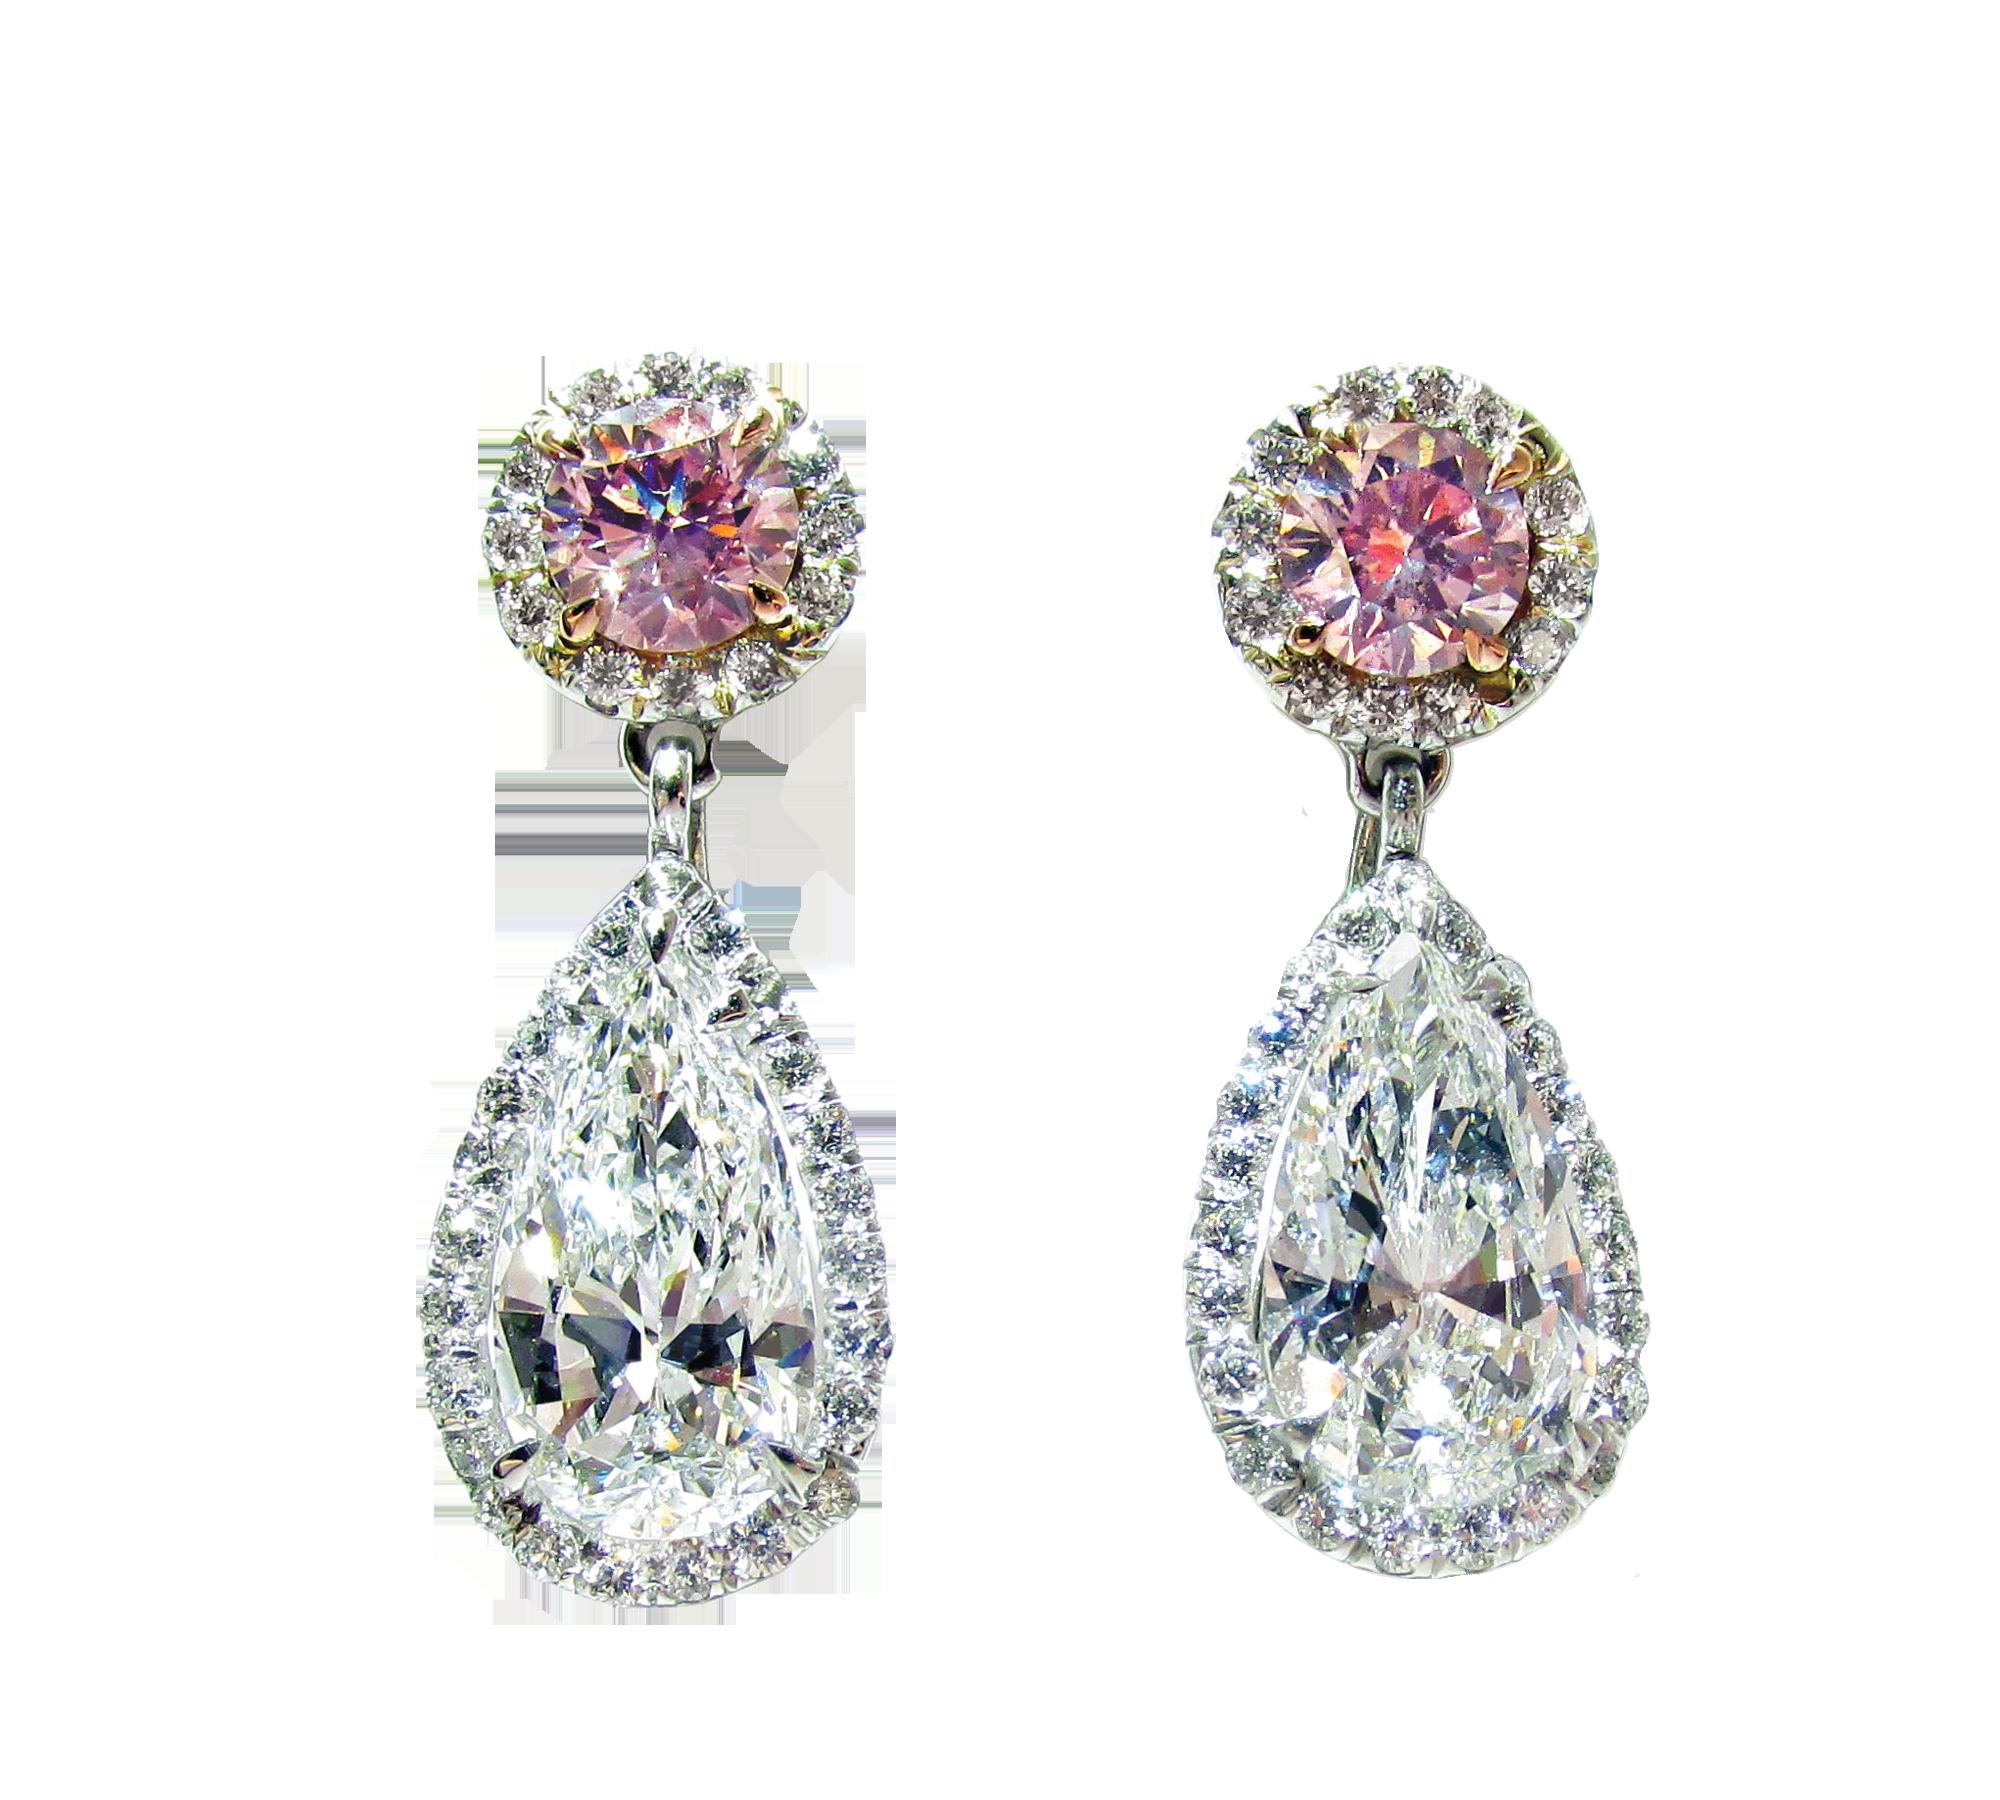 beuchner-diamond-drops-__.png